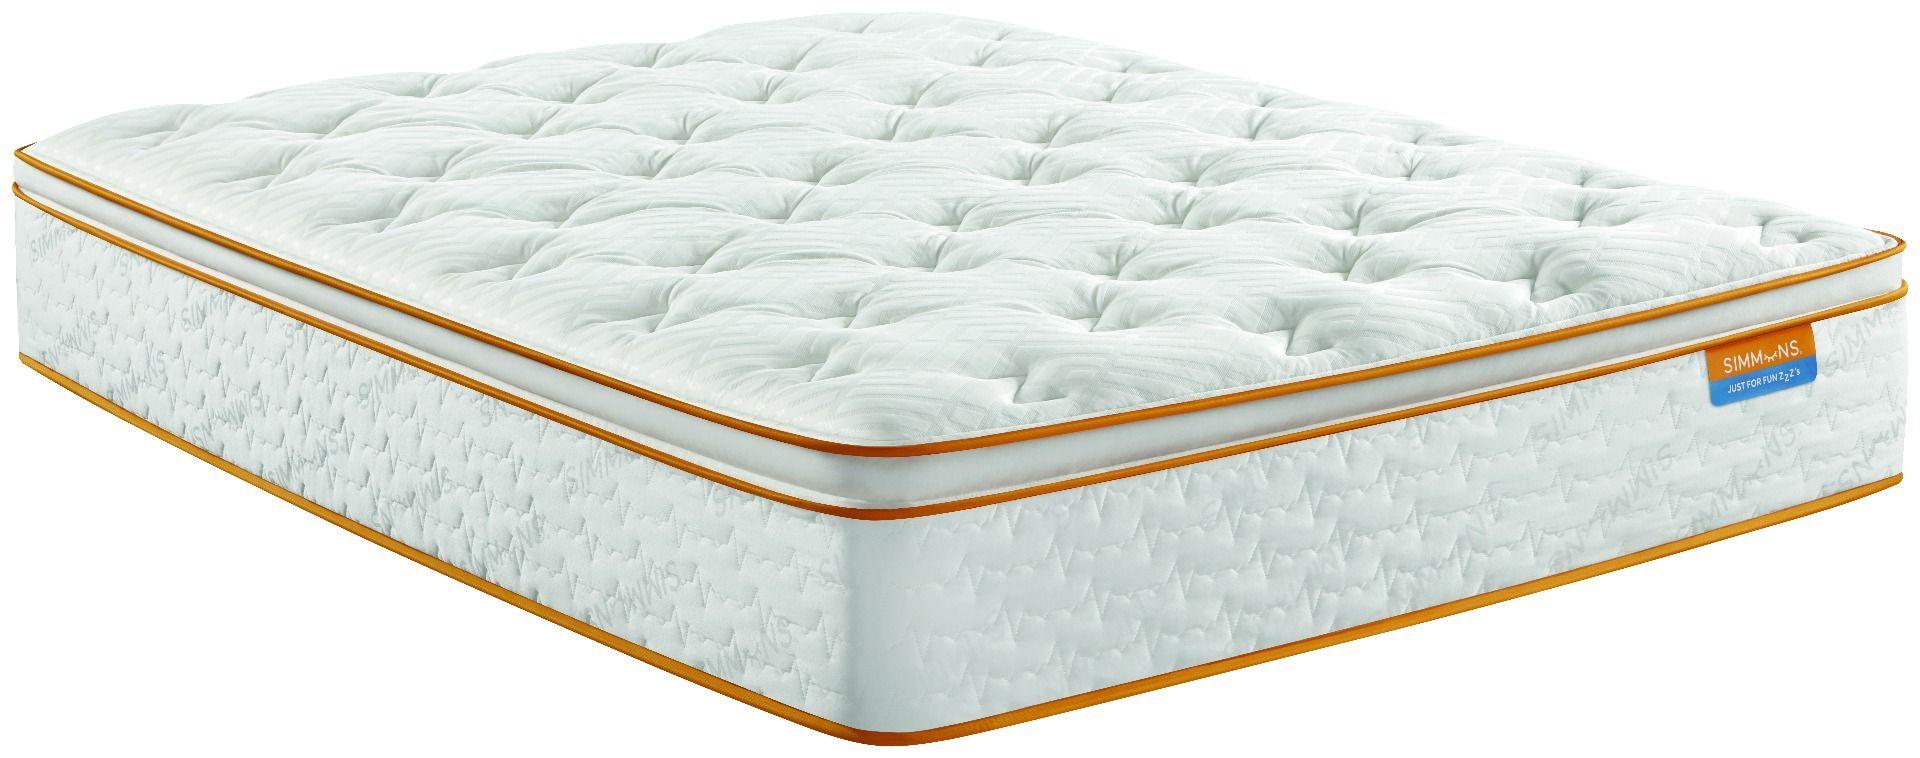 simmons sleep thrillzzz plush pillow top mattress single twin